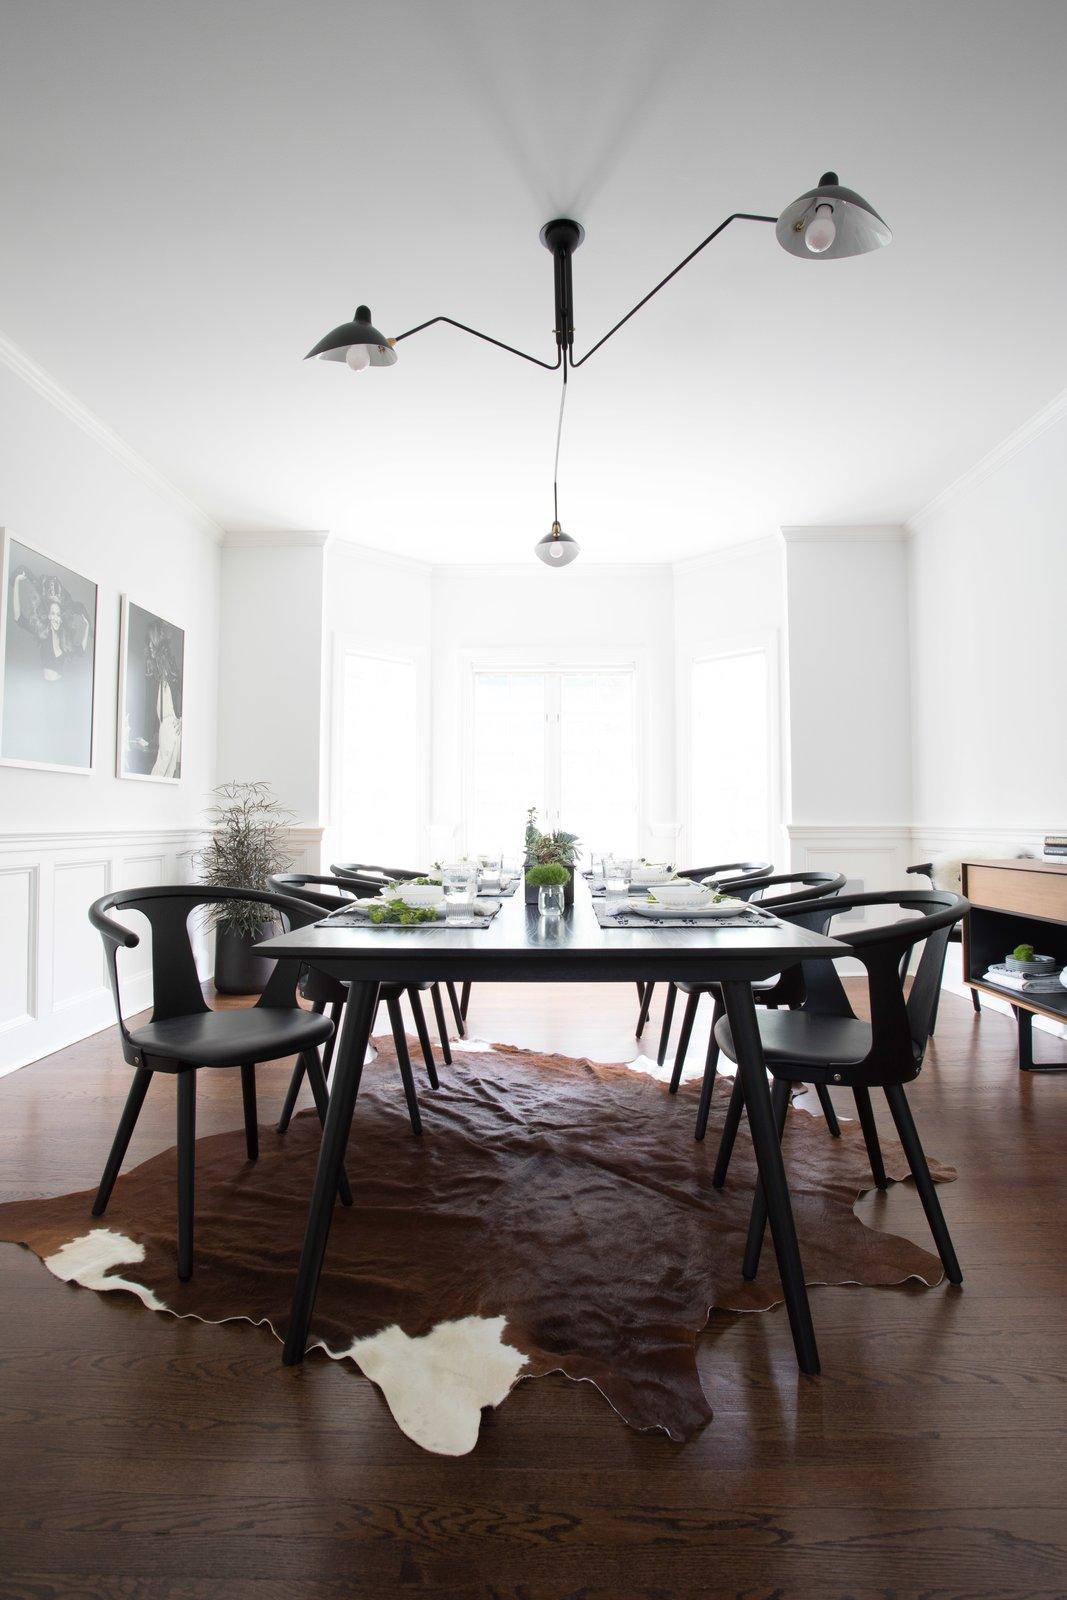 Dining, Ceiling, Dark Hardwood, Chair, and Table Formal Dining room   Best Dining Dark Hardwood Ceiling Photos